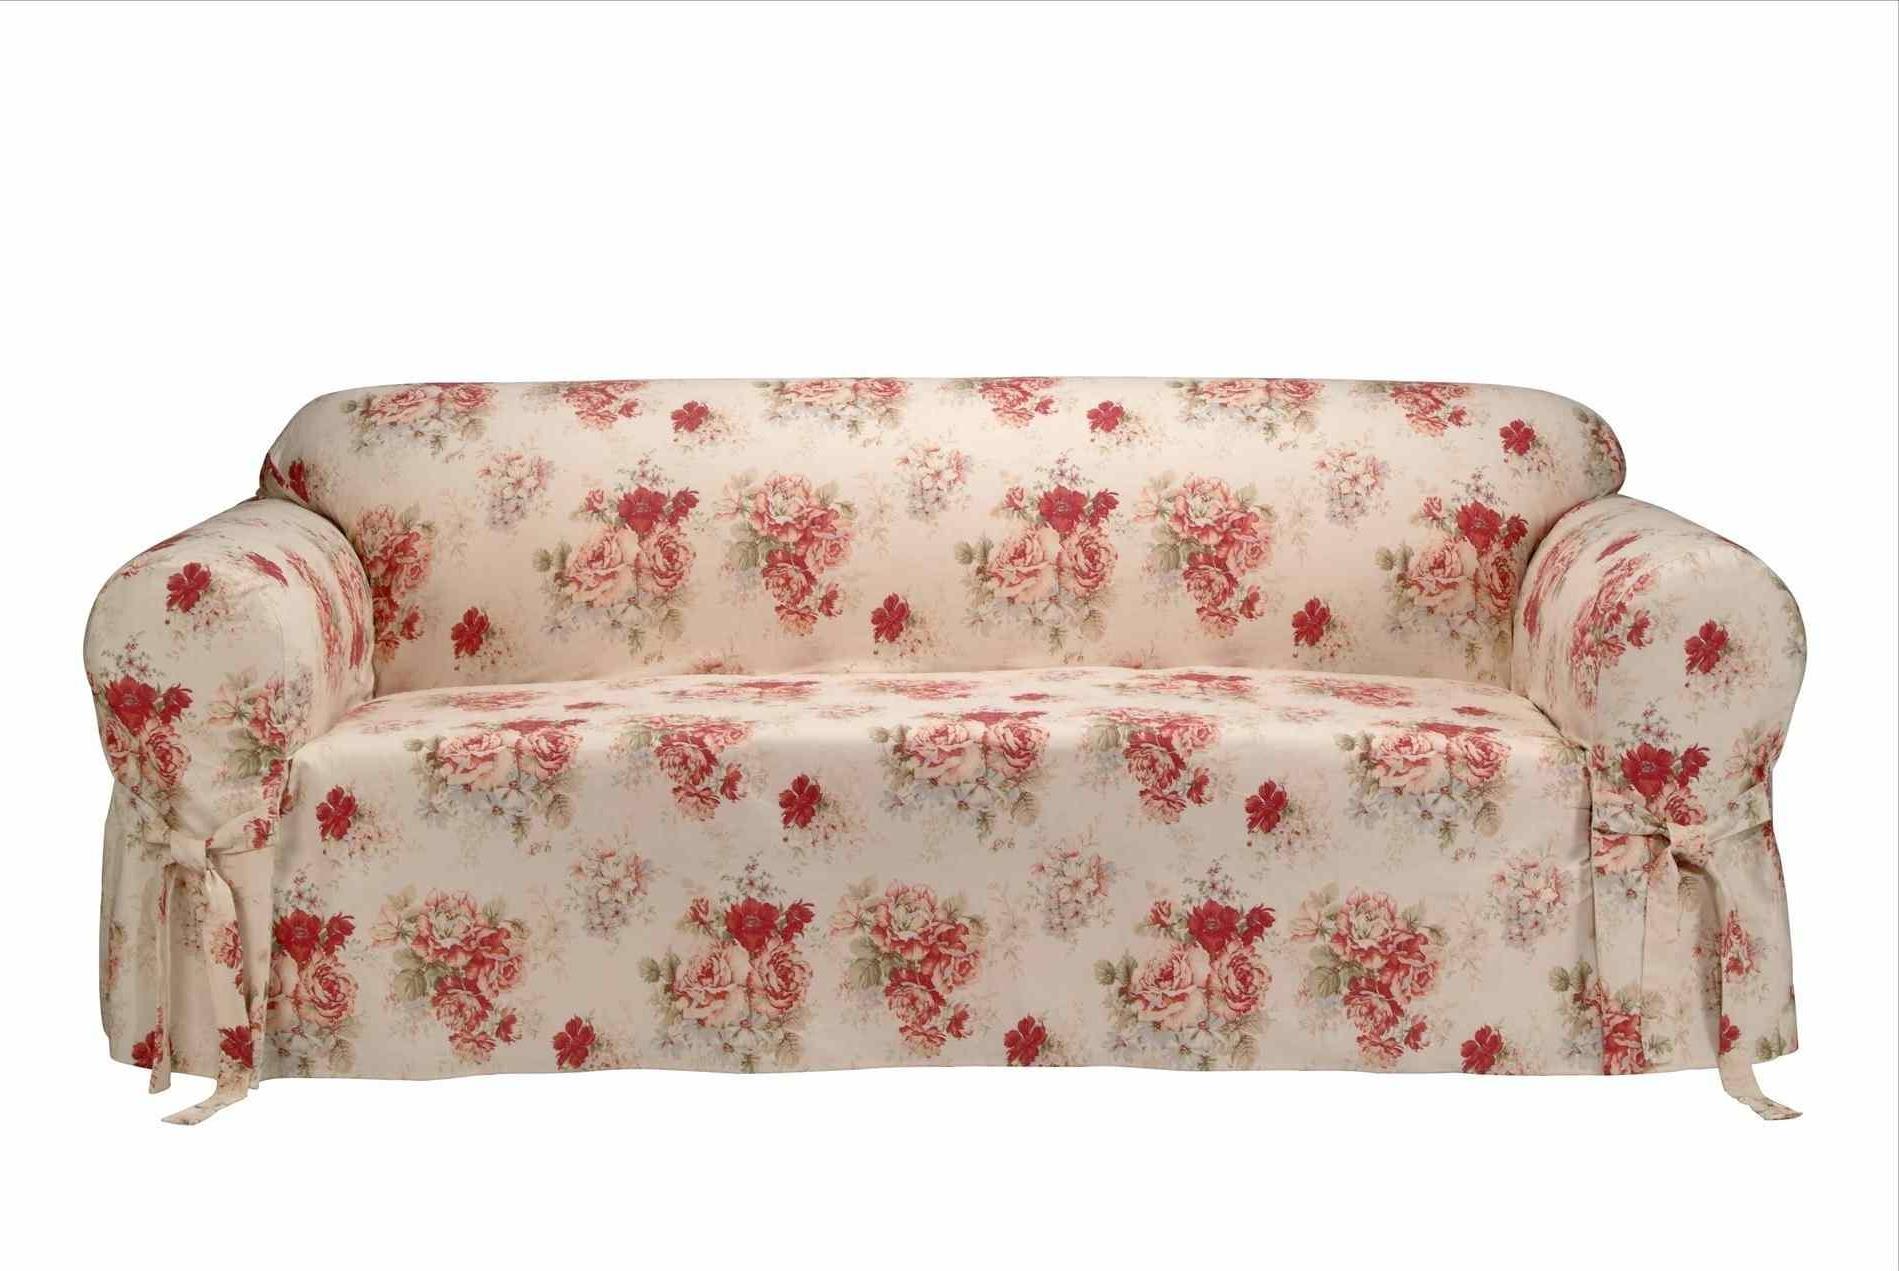 Chintz Sofa Elegantes Sofa Couch Chintz Satin Goldfarbe Regarding Chintz Sofas (View 7 of 15)